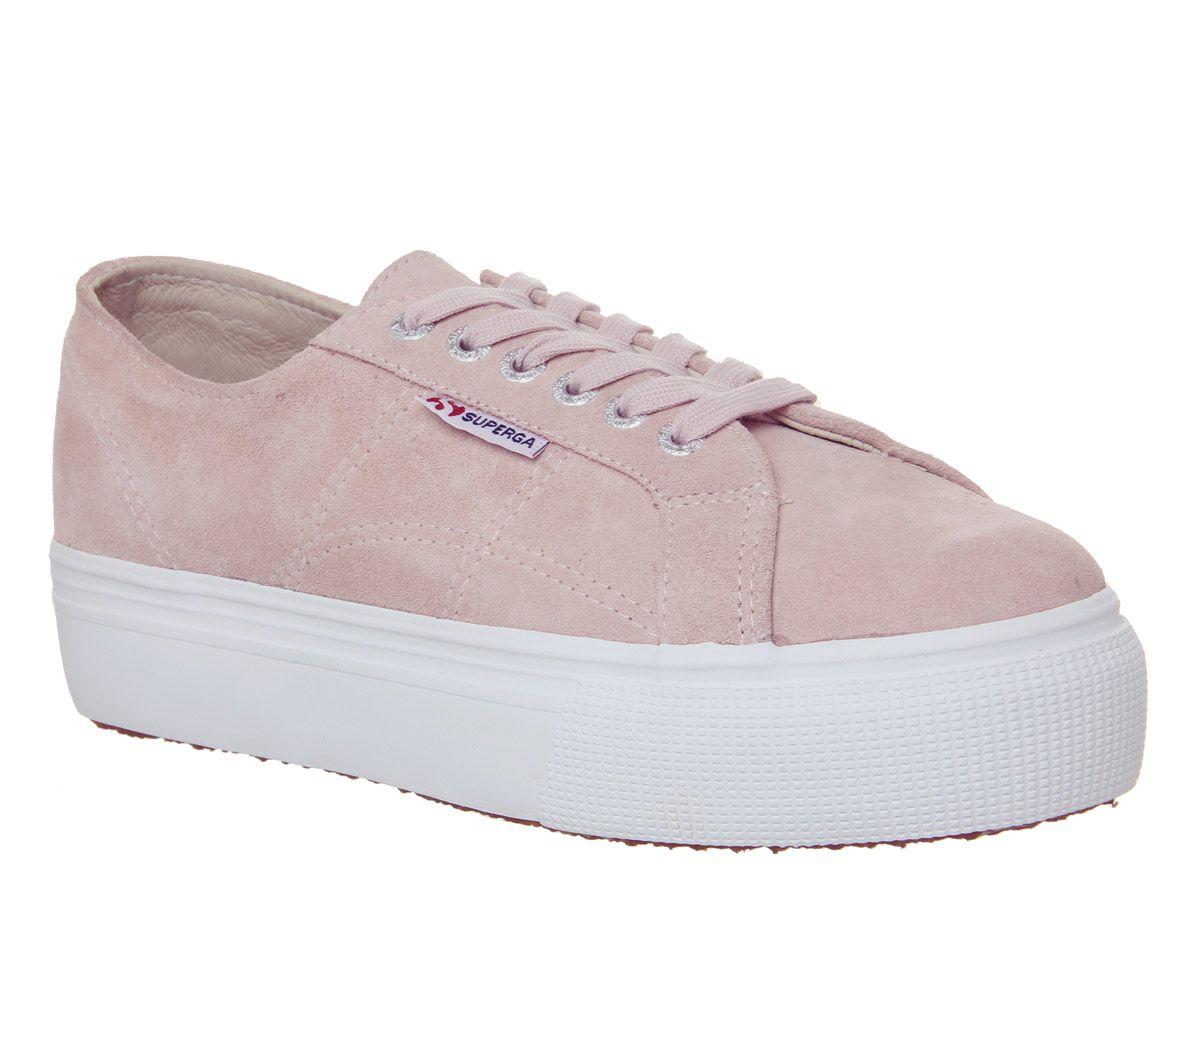 1cbe72ea362c9 Superga 2790 (l) Pink Skin - Hers trainers